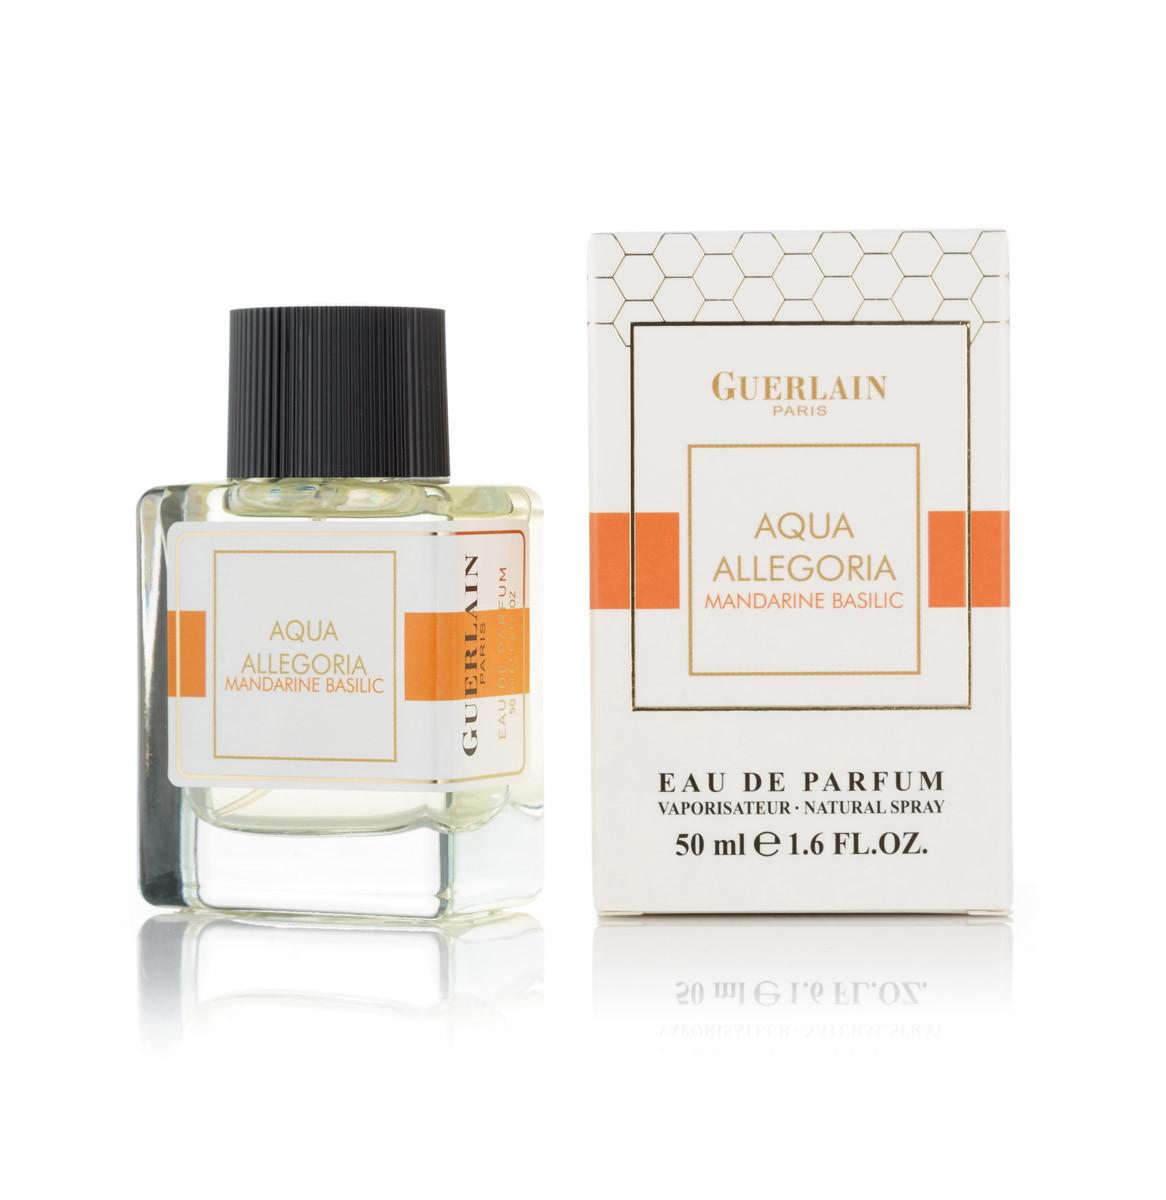 Женский мини парфюм Aqua Allegoria Mandarine Basilic - 50 мл (код: 420)